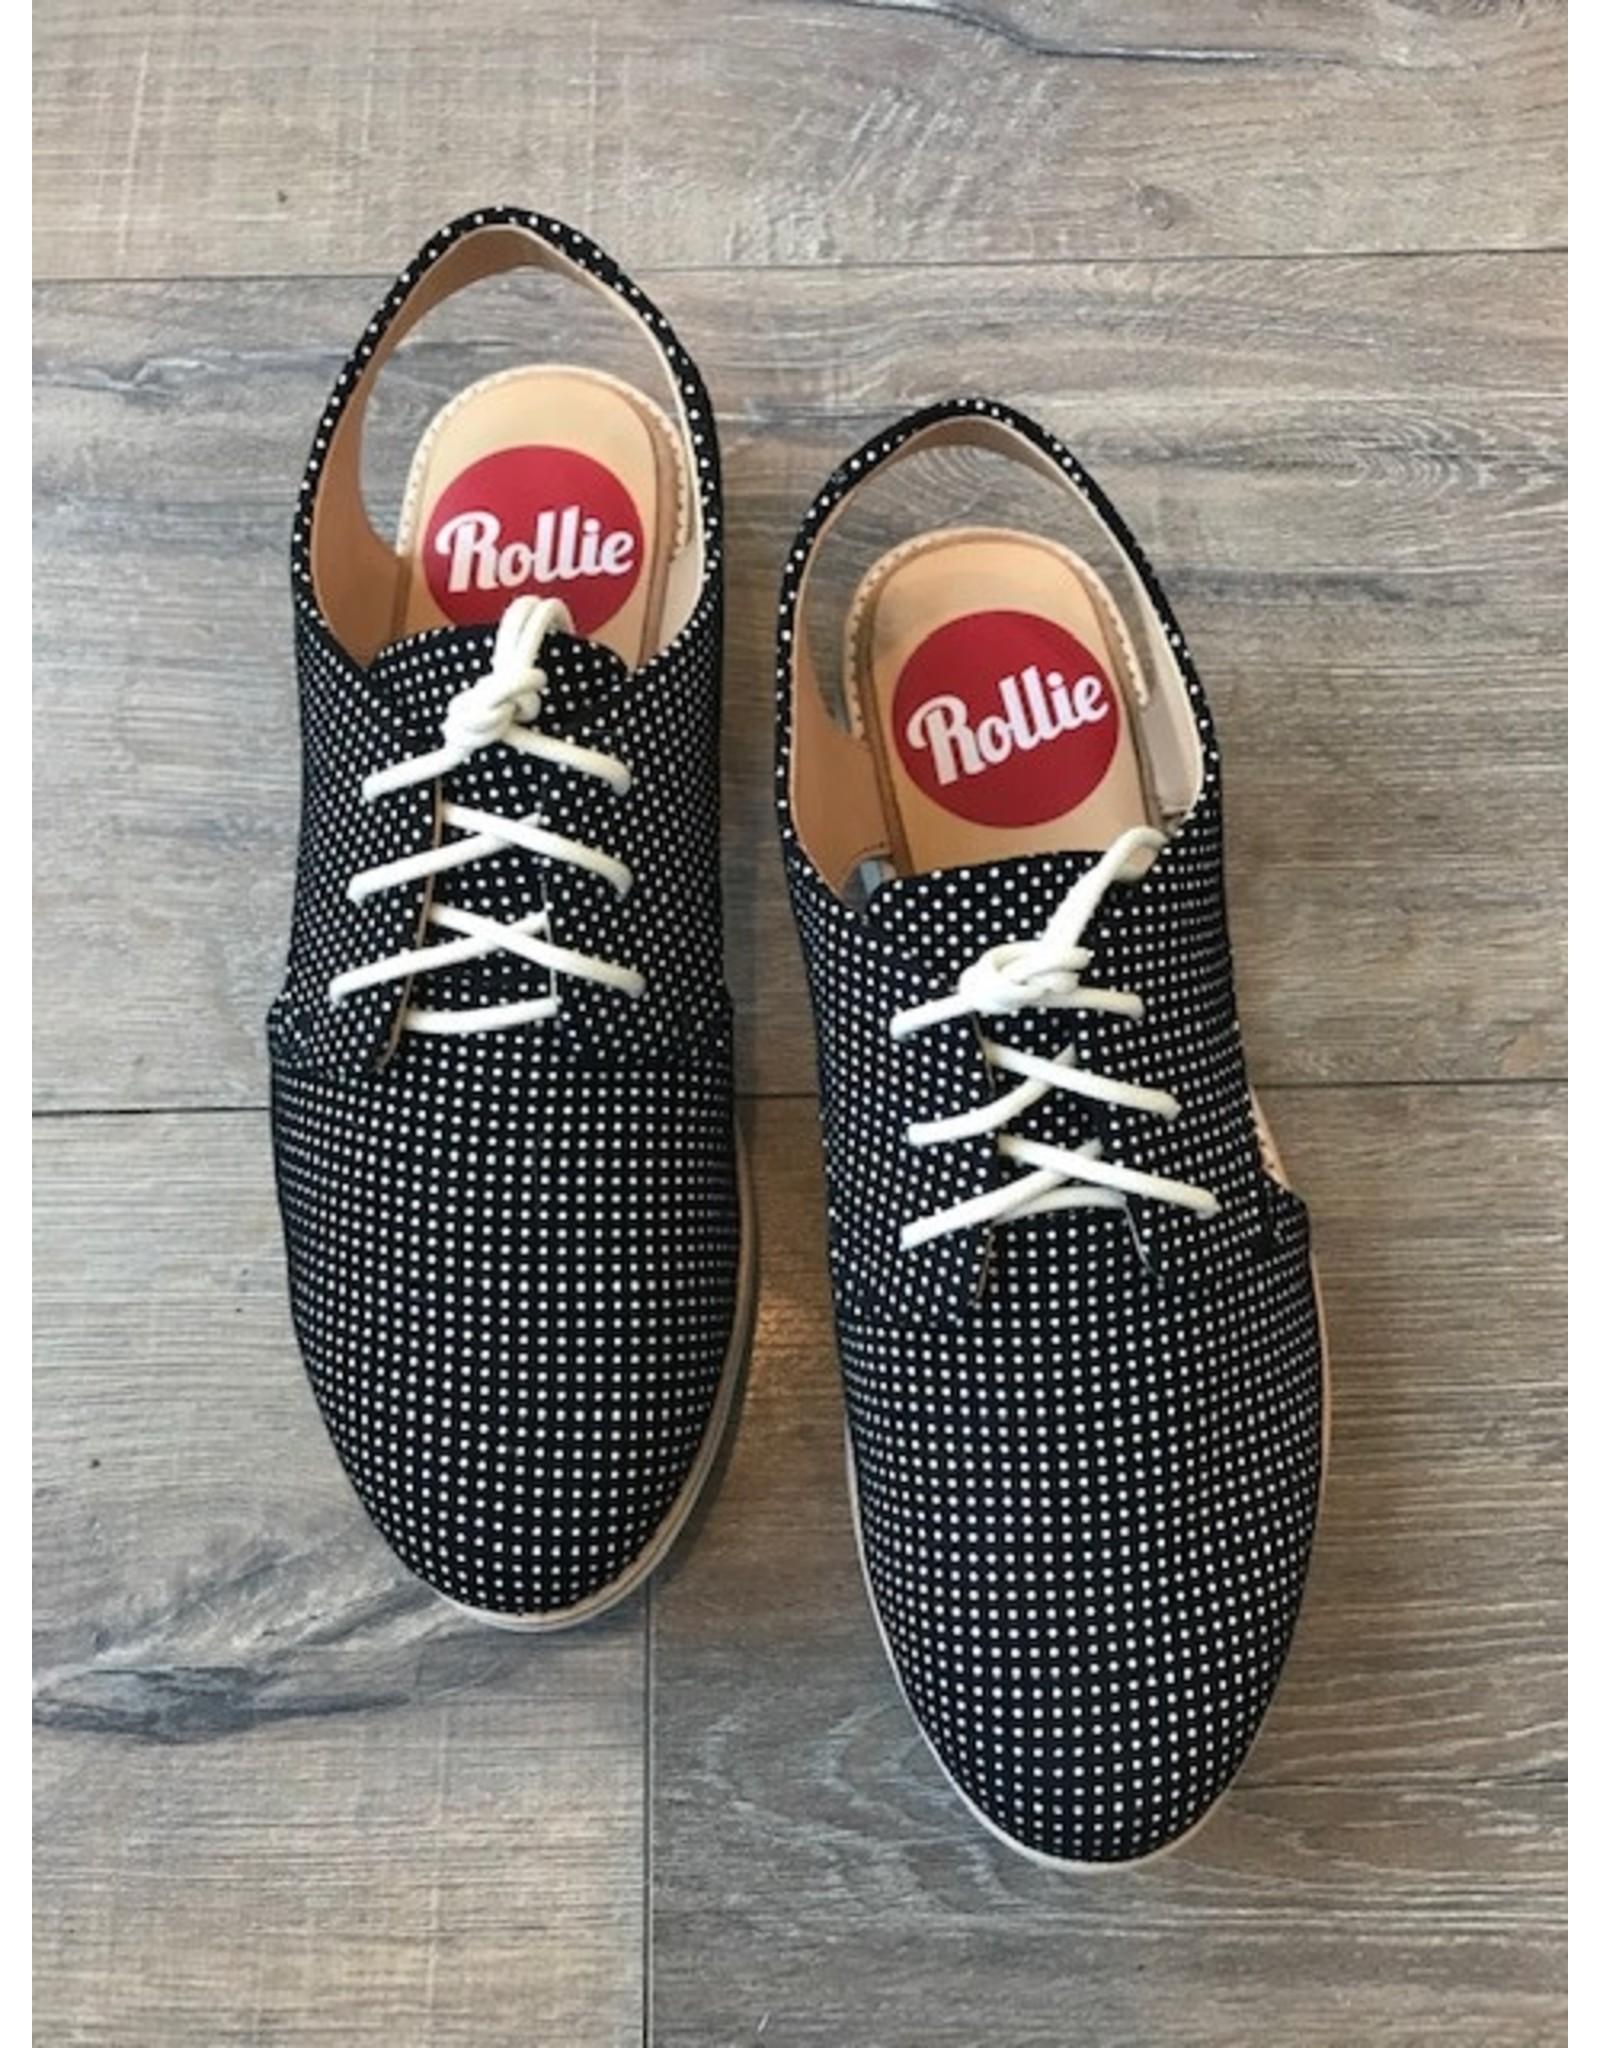 Rollie Shoes Rollie - Slingback (Black Dream)